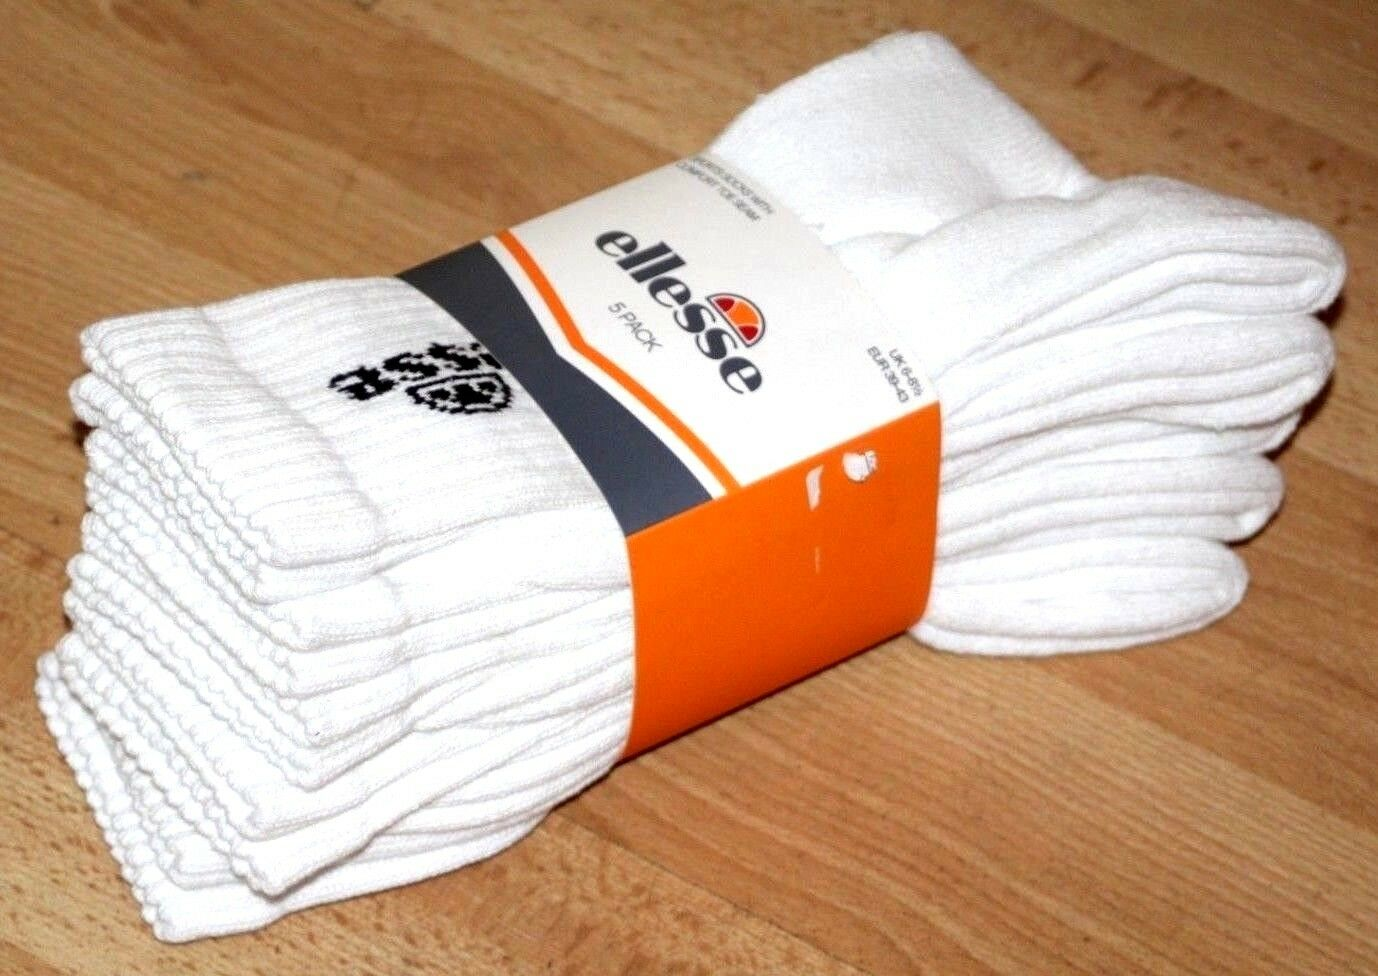 Ellesse Italia Italia Ellesse Homme Coolmax Chaussettes De Sport Pack de 5 RRP £ 16 UE 9-12 UE 43-46 f52ba4